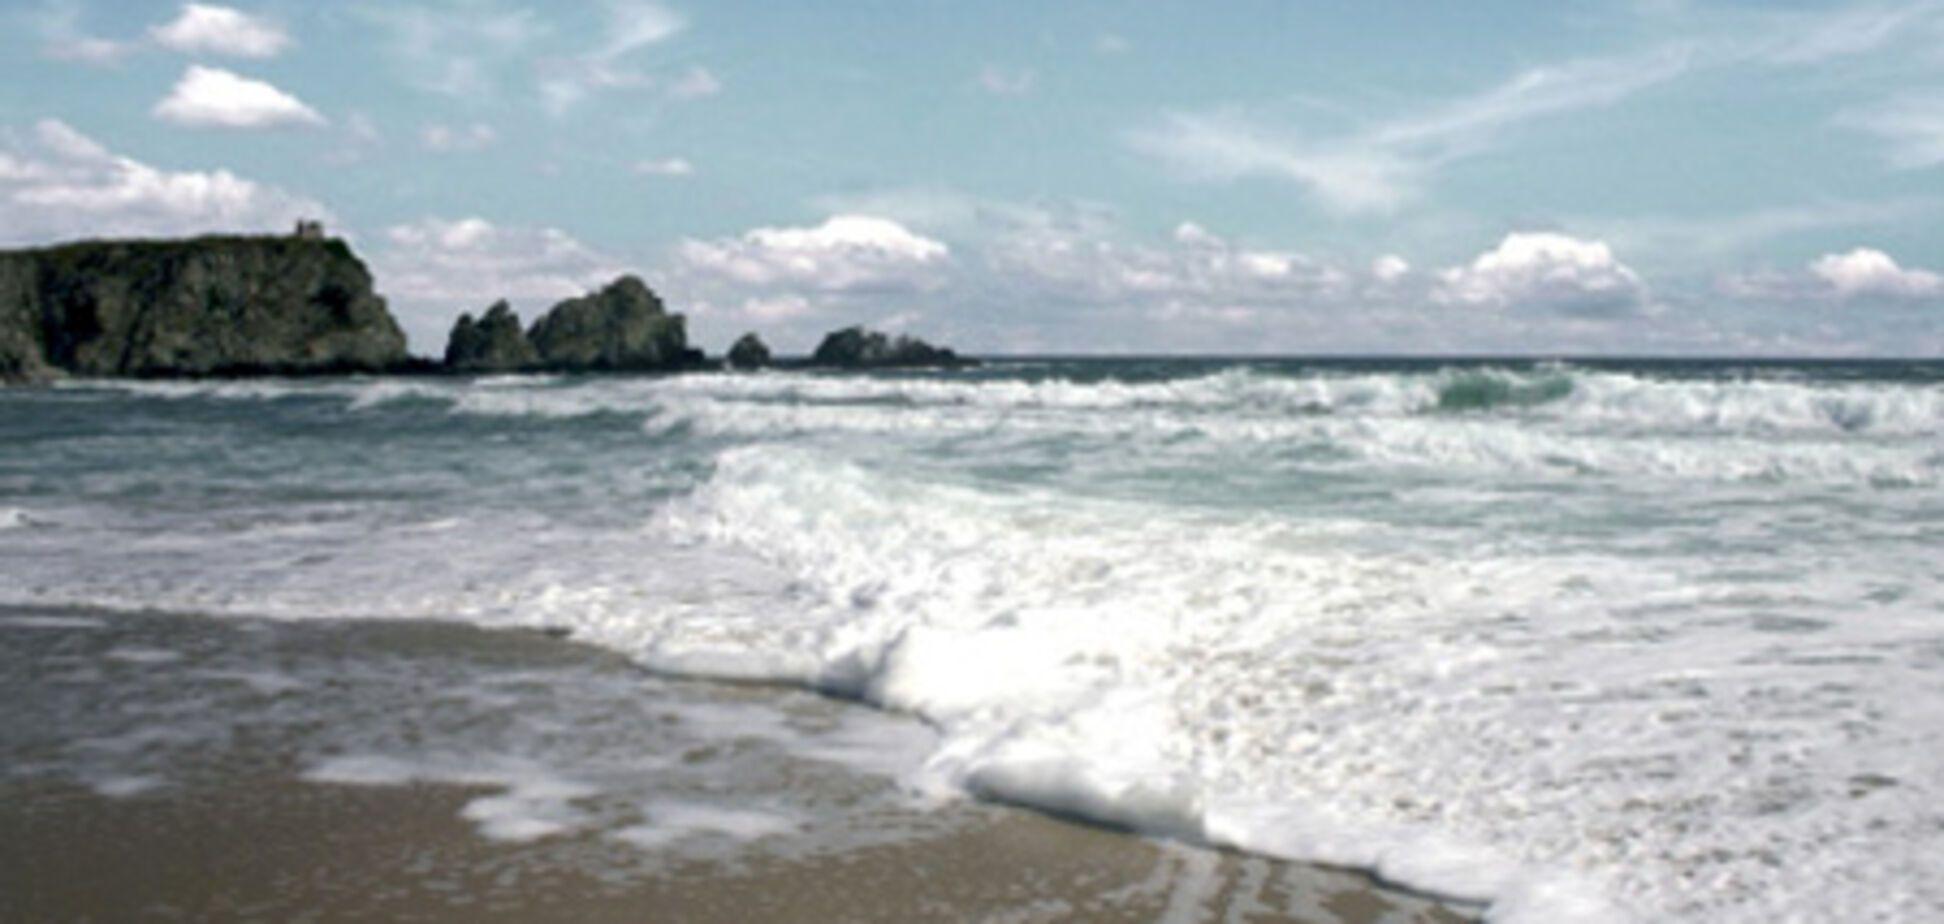 В Черном море нашли труп капитана буксира